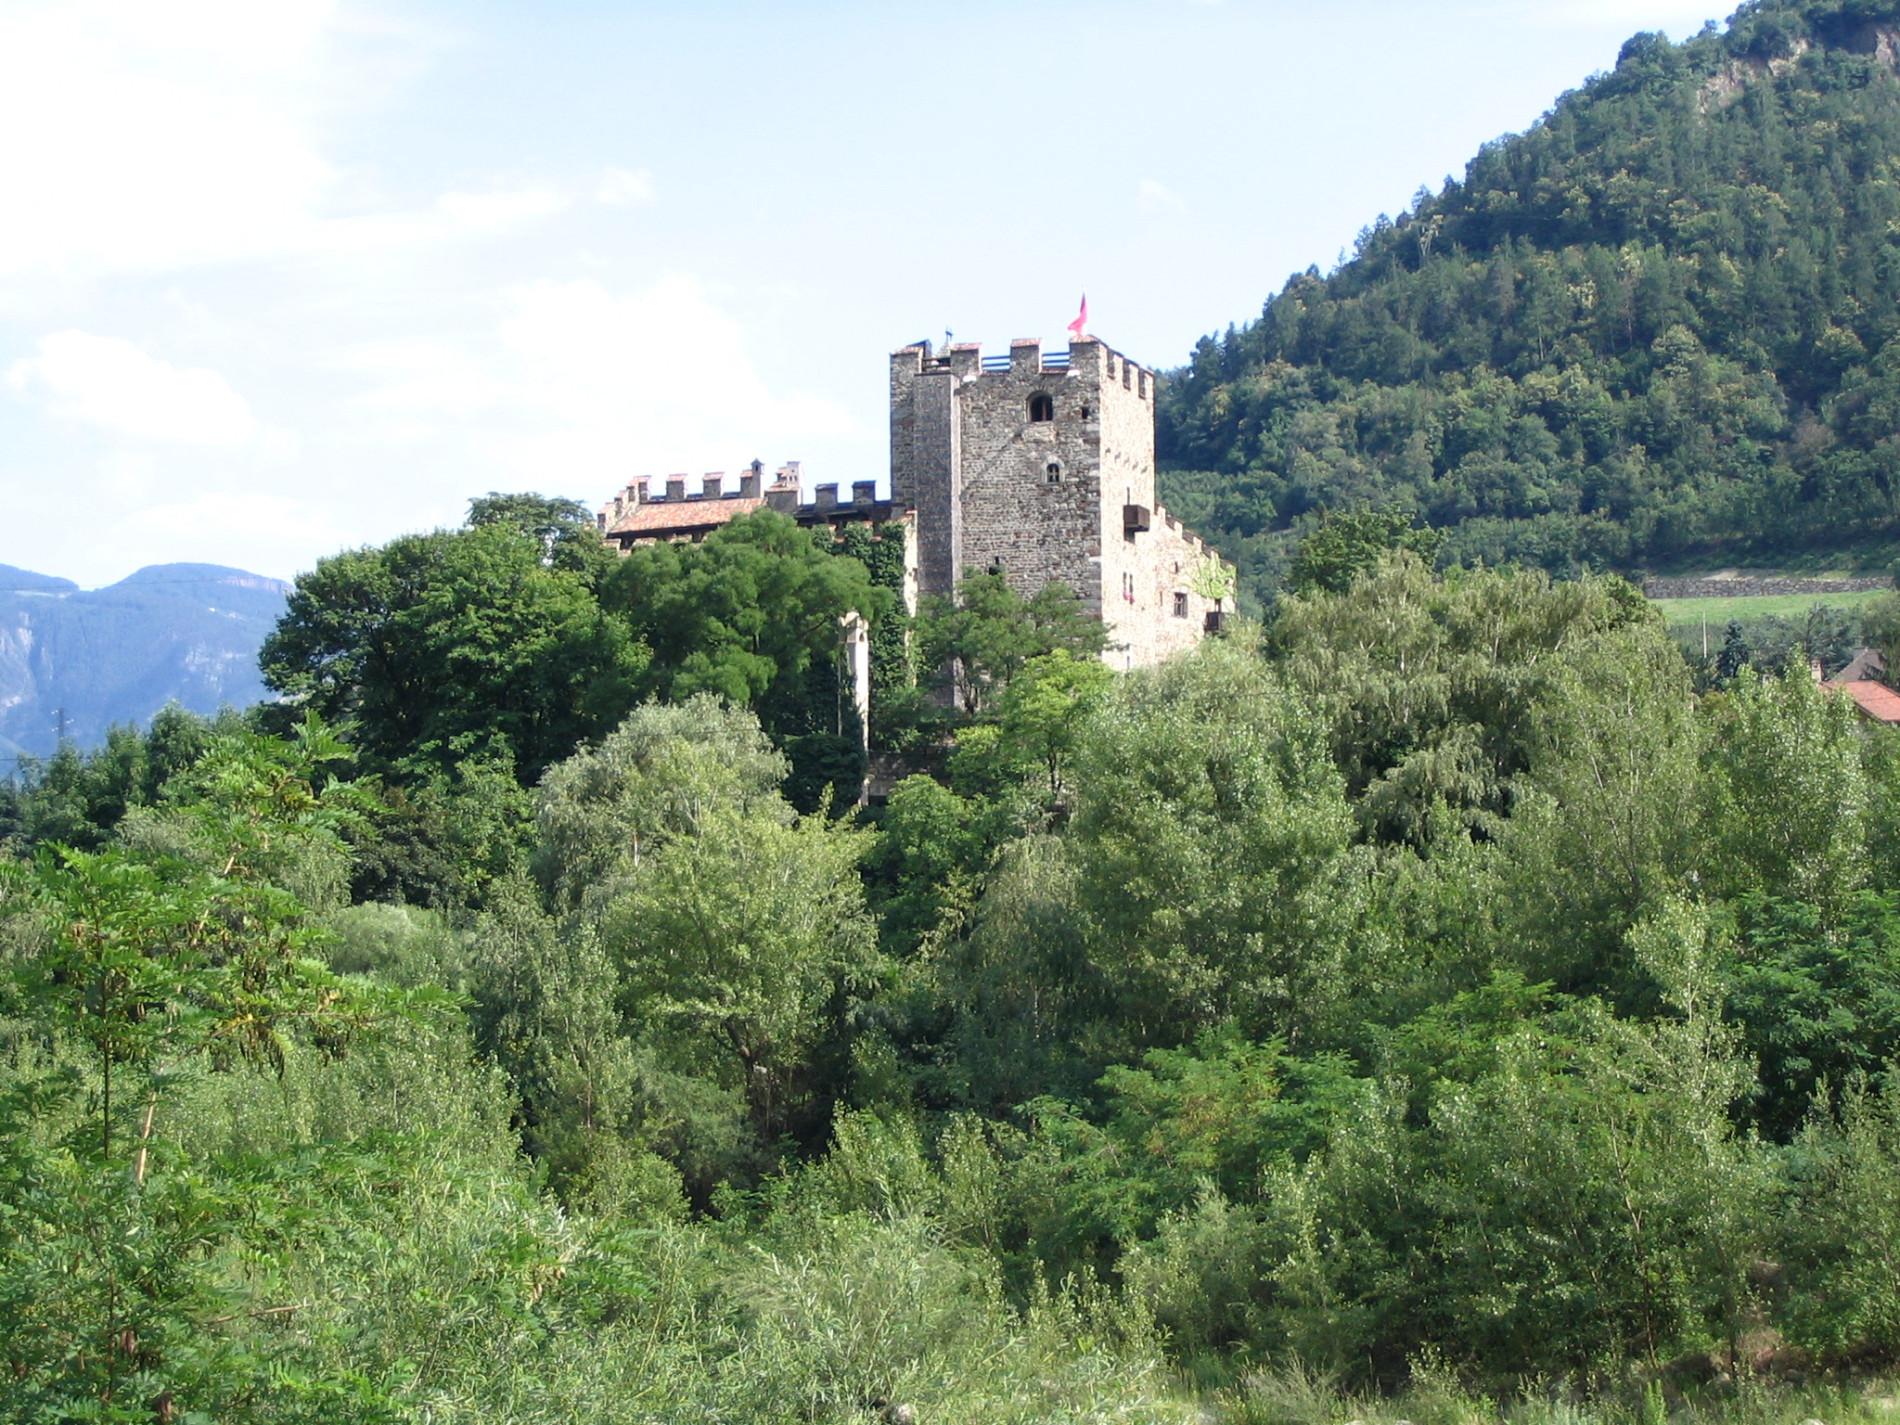 Burg Dornsberg